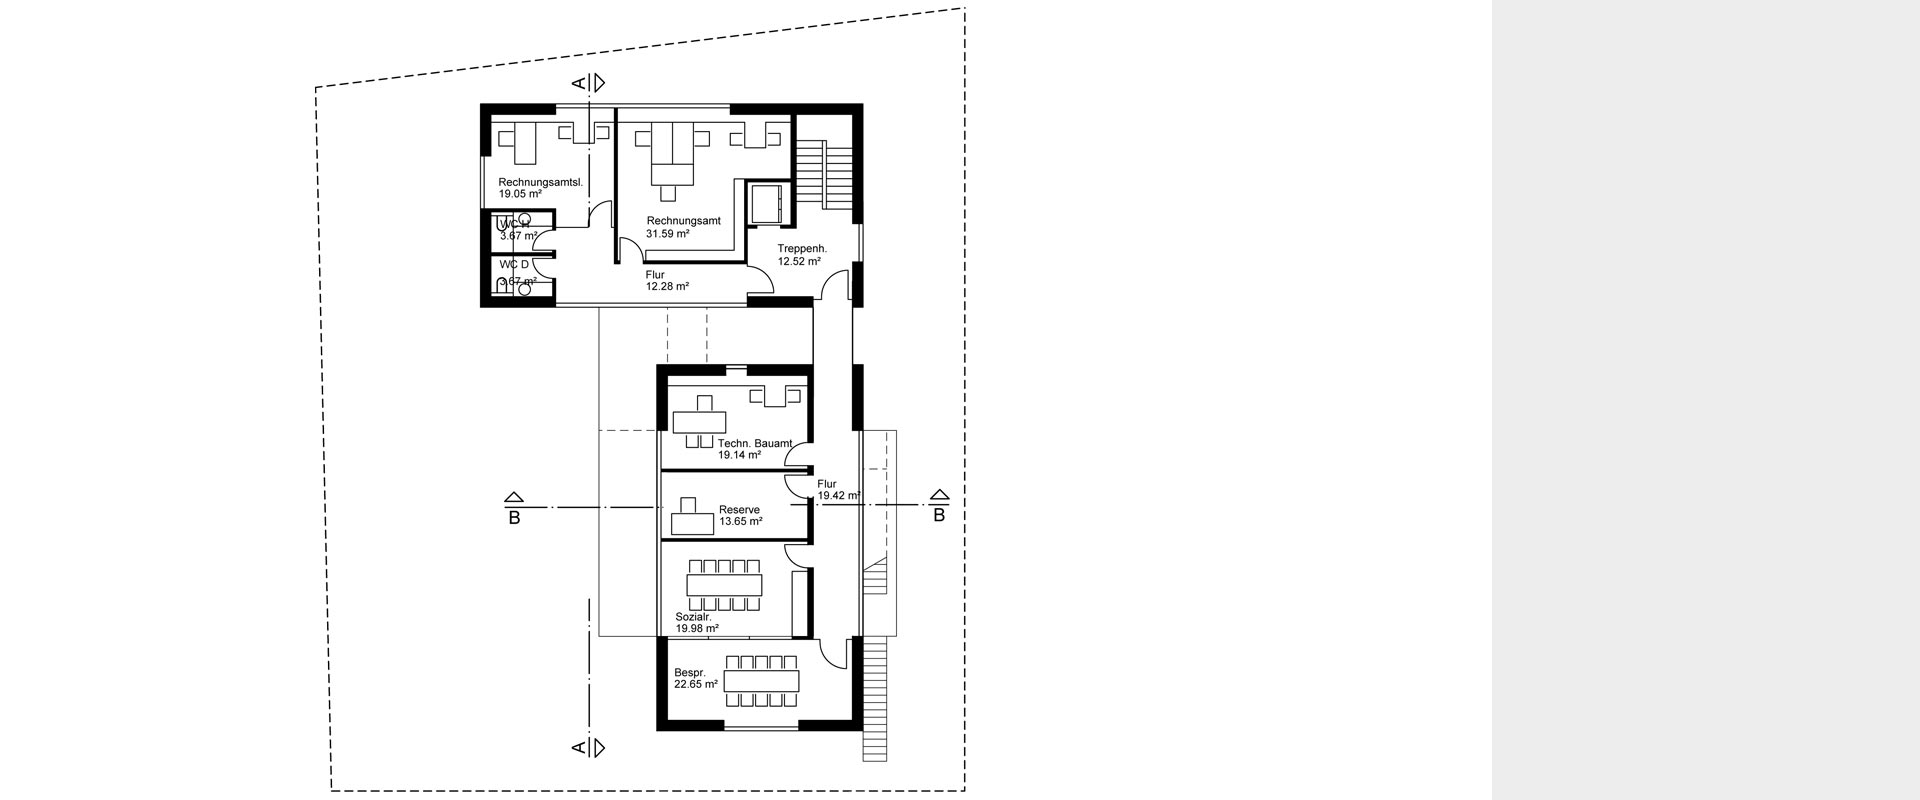 Architekturbüro musahl Waldshut Rathaus Dogern Grundriss OG 1